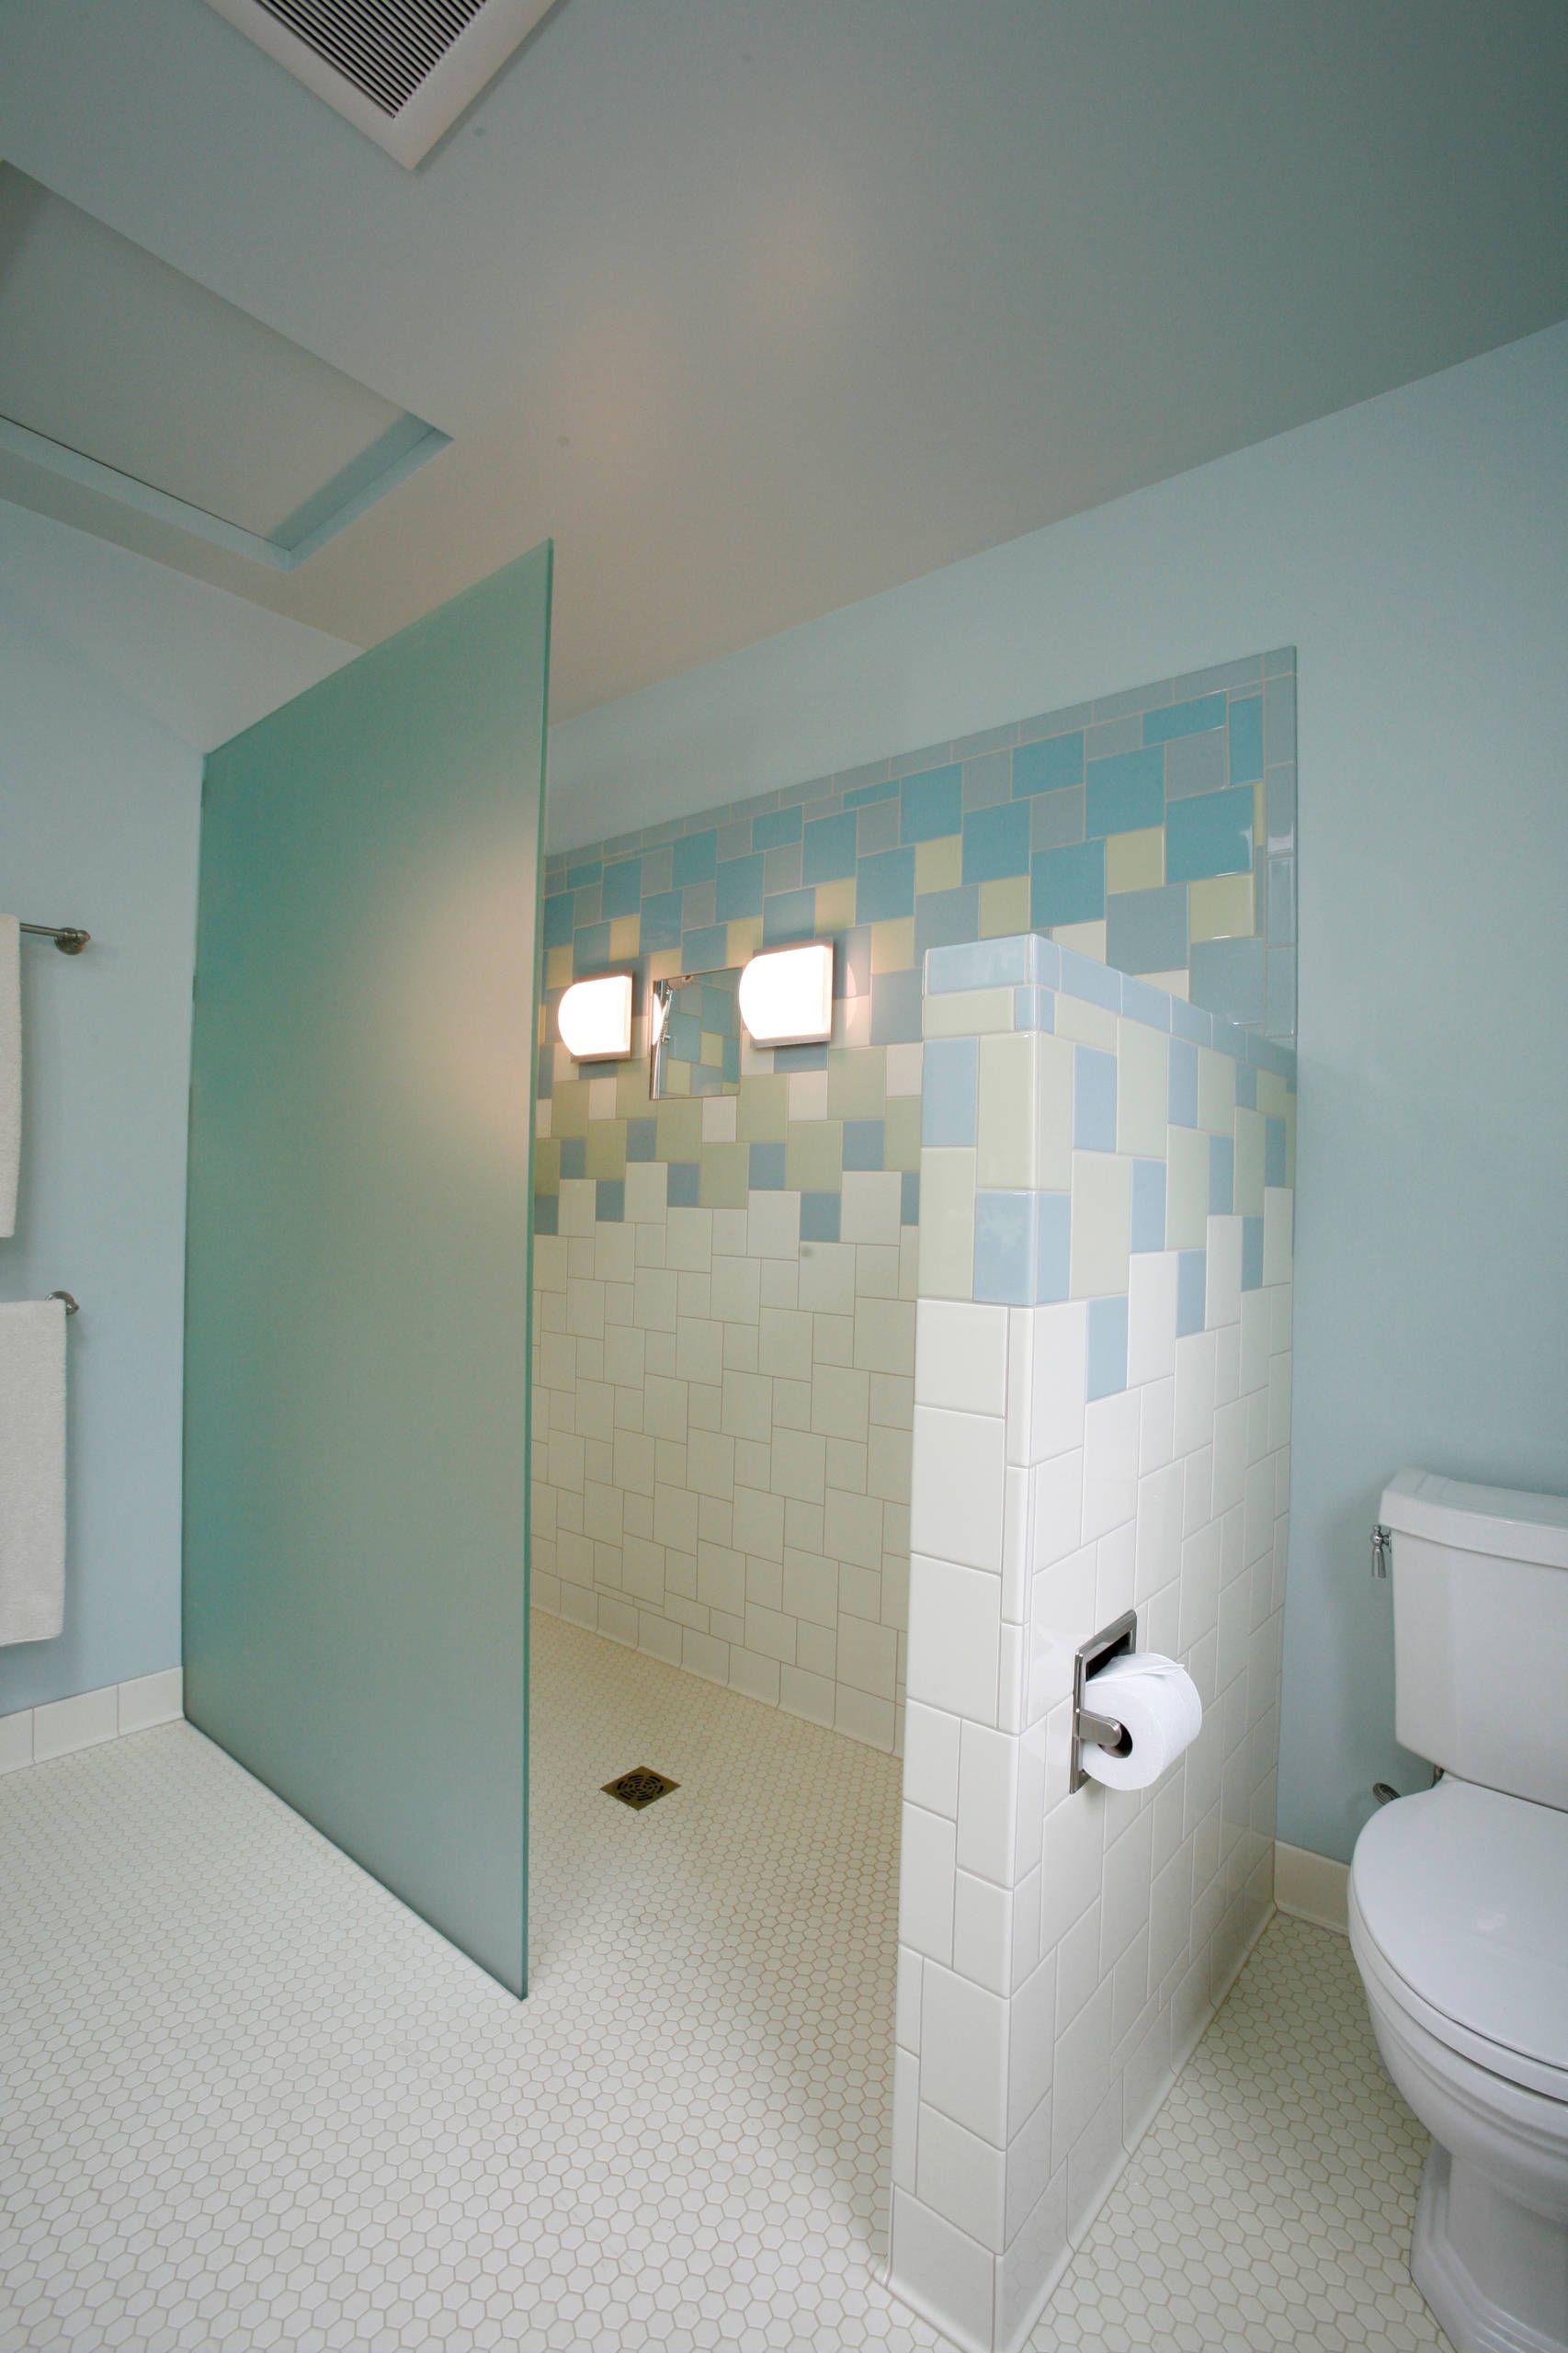 Beautiful bathroom design ideas using doorless shower - Doorless shower in small bathroom ...